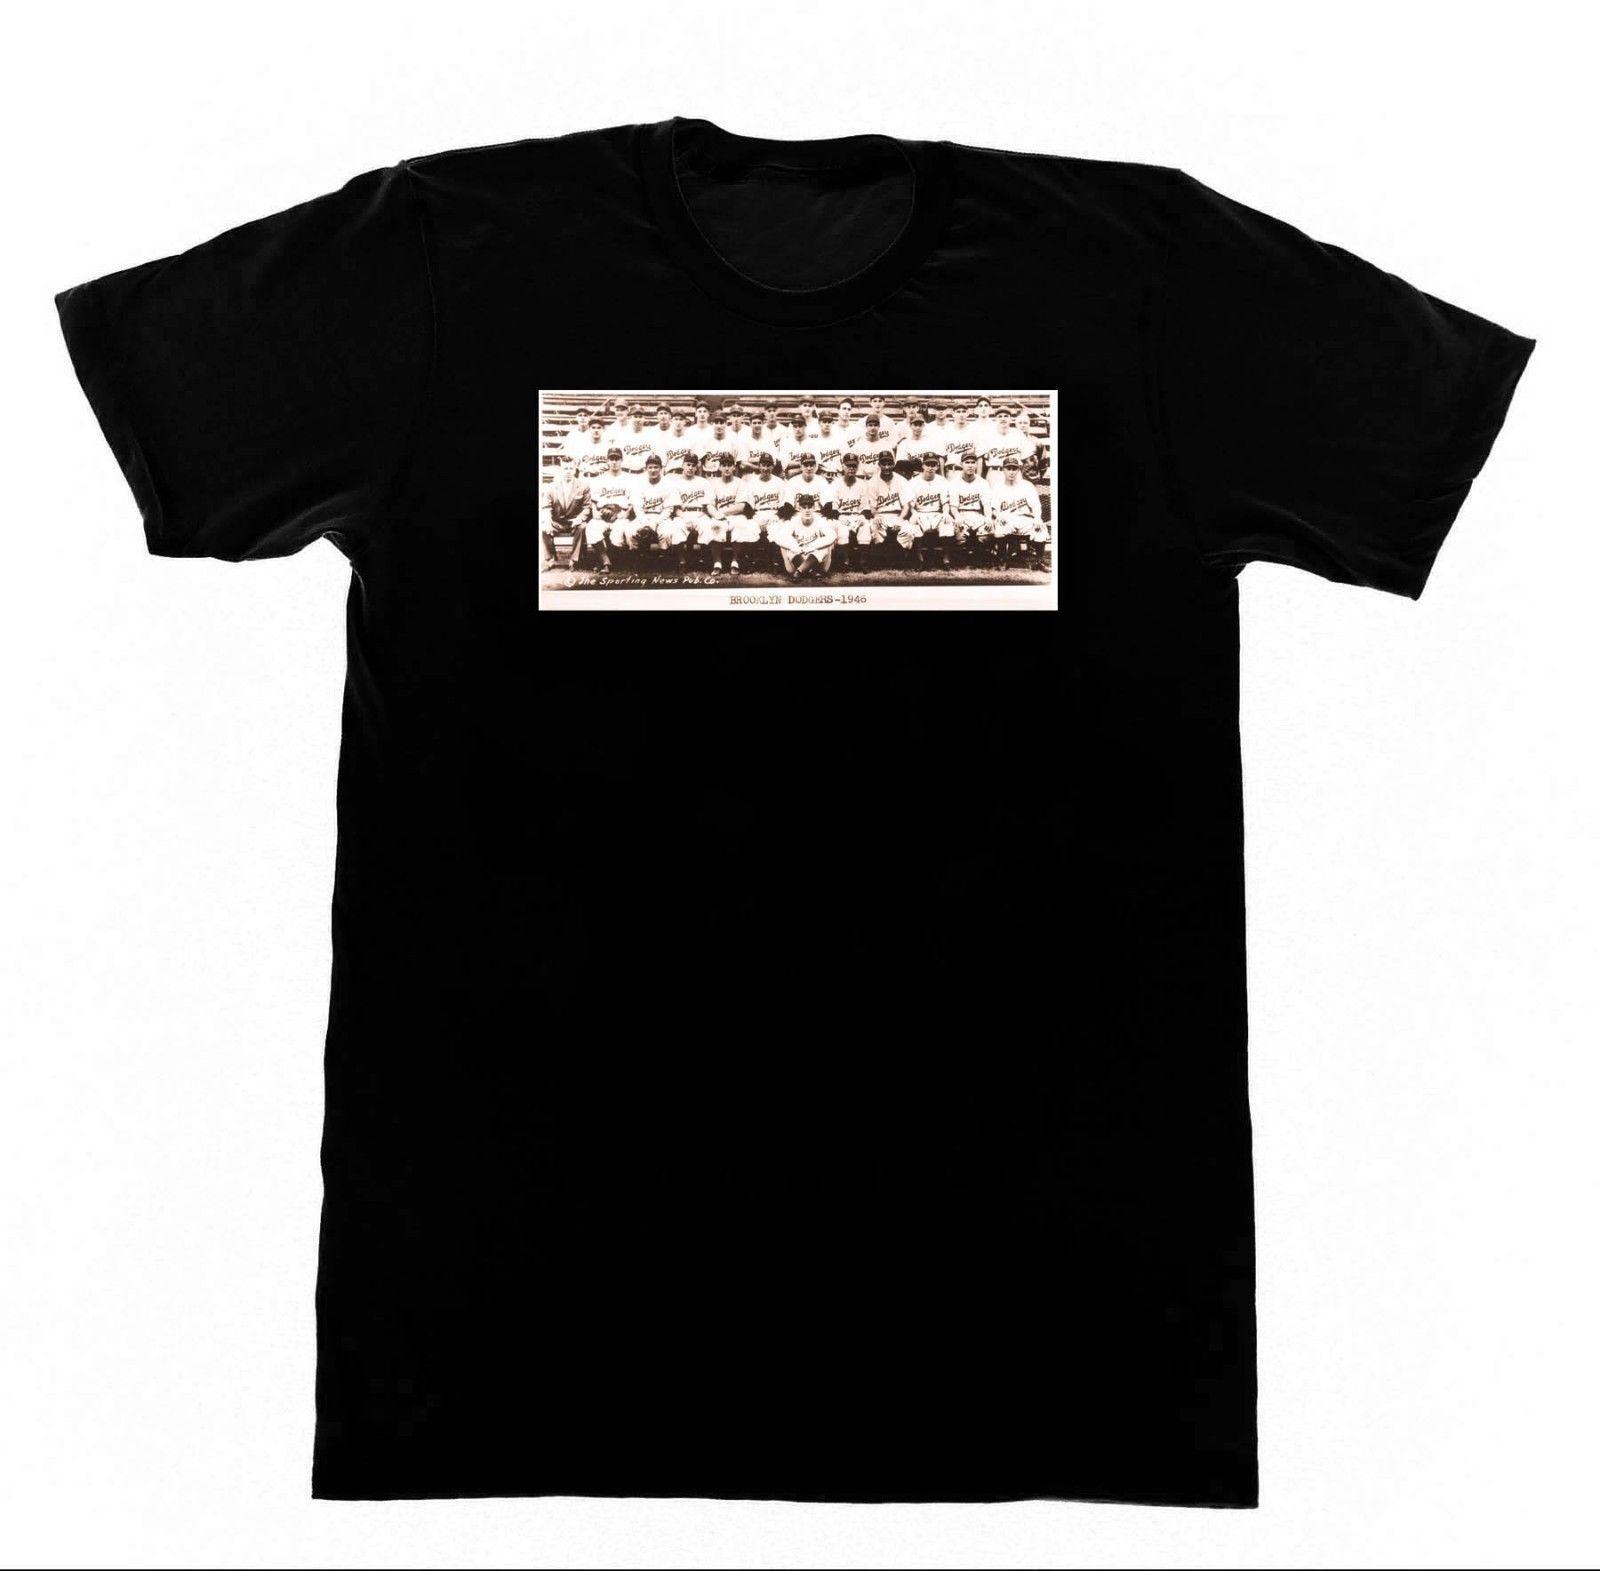 1946 Brooklyn Wholesale Discount Team Photo - Shirt B6 T-shirt Vintage  Baseball Bums Men 2018 Summer Round Neck Men s T Shirt